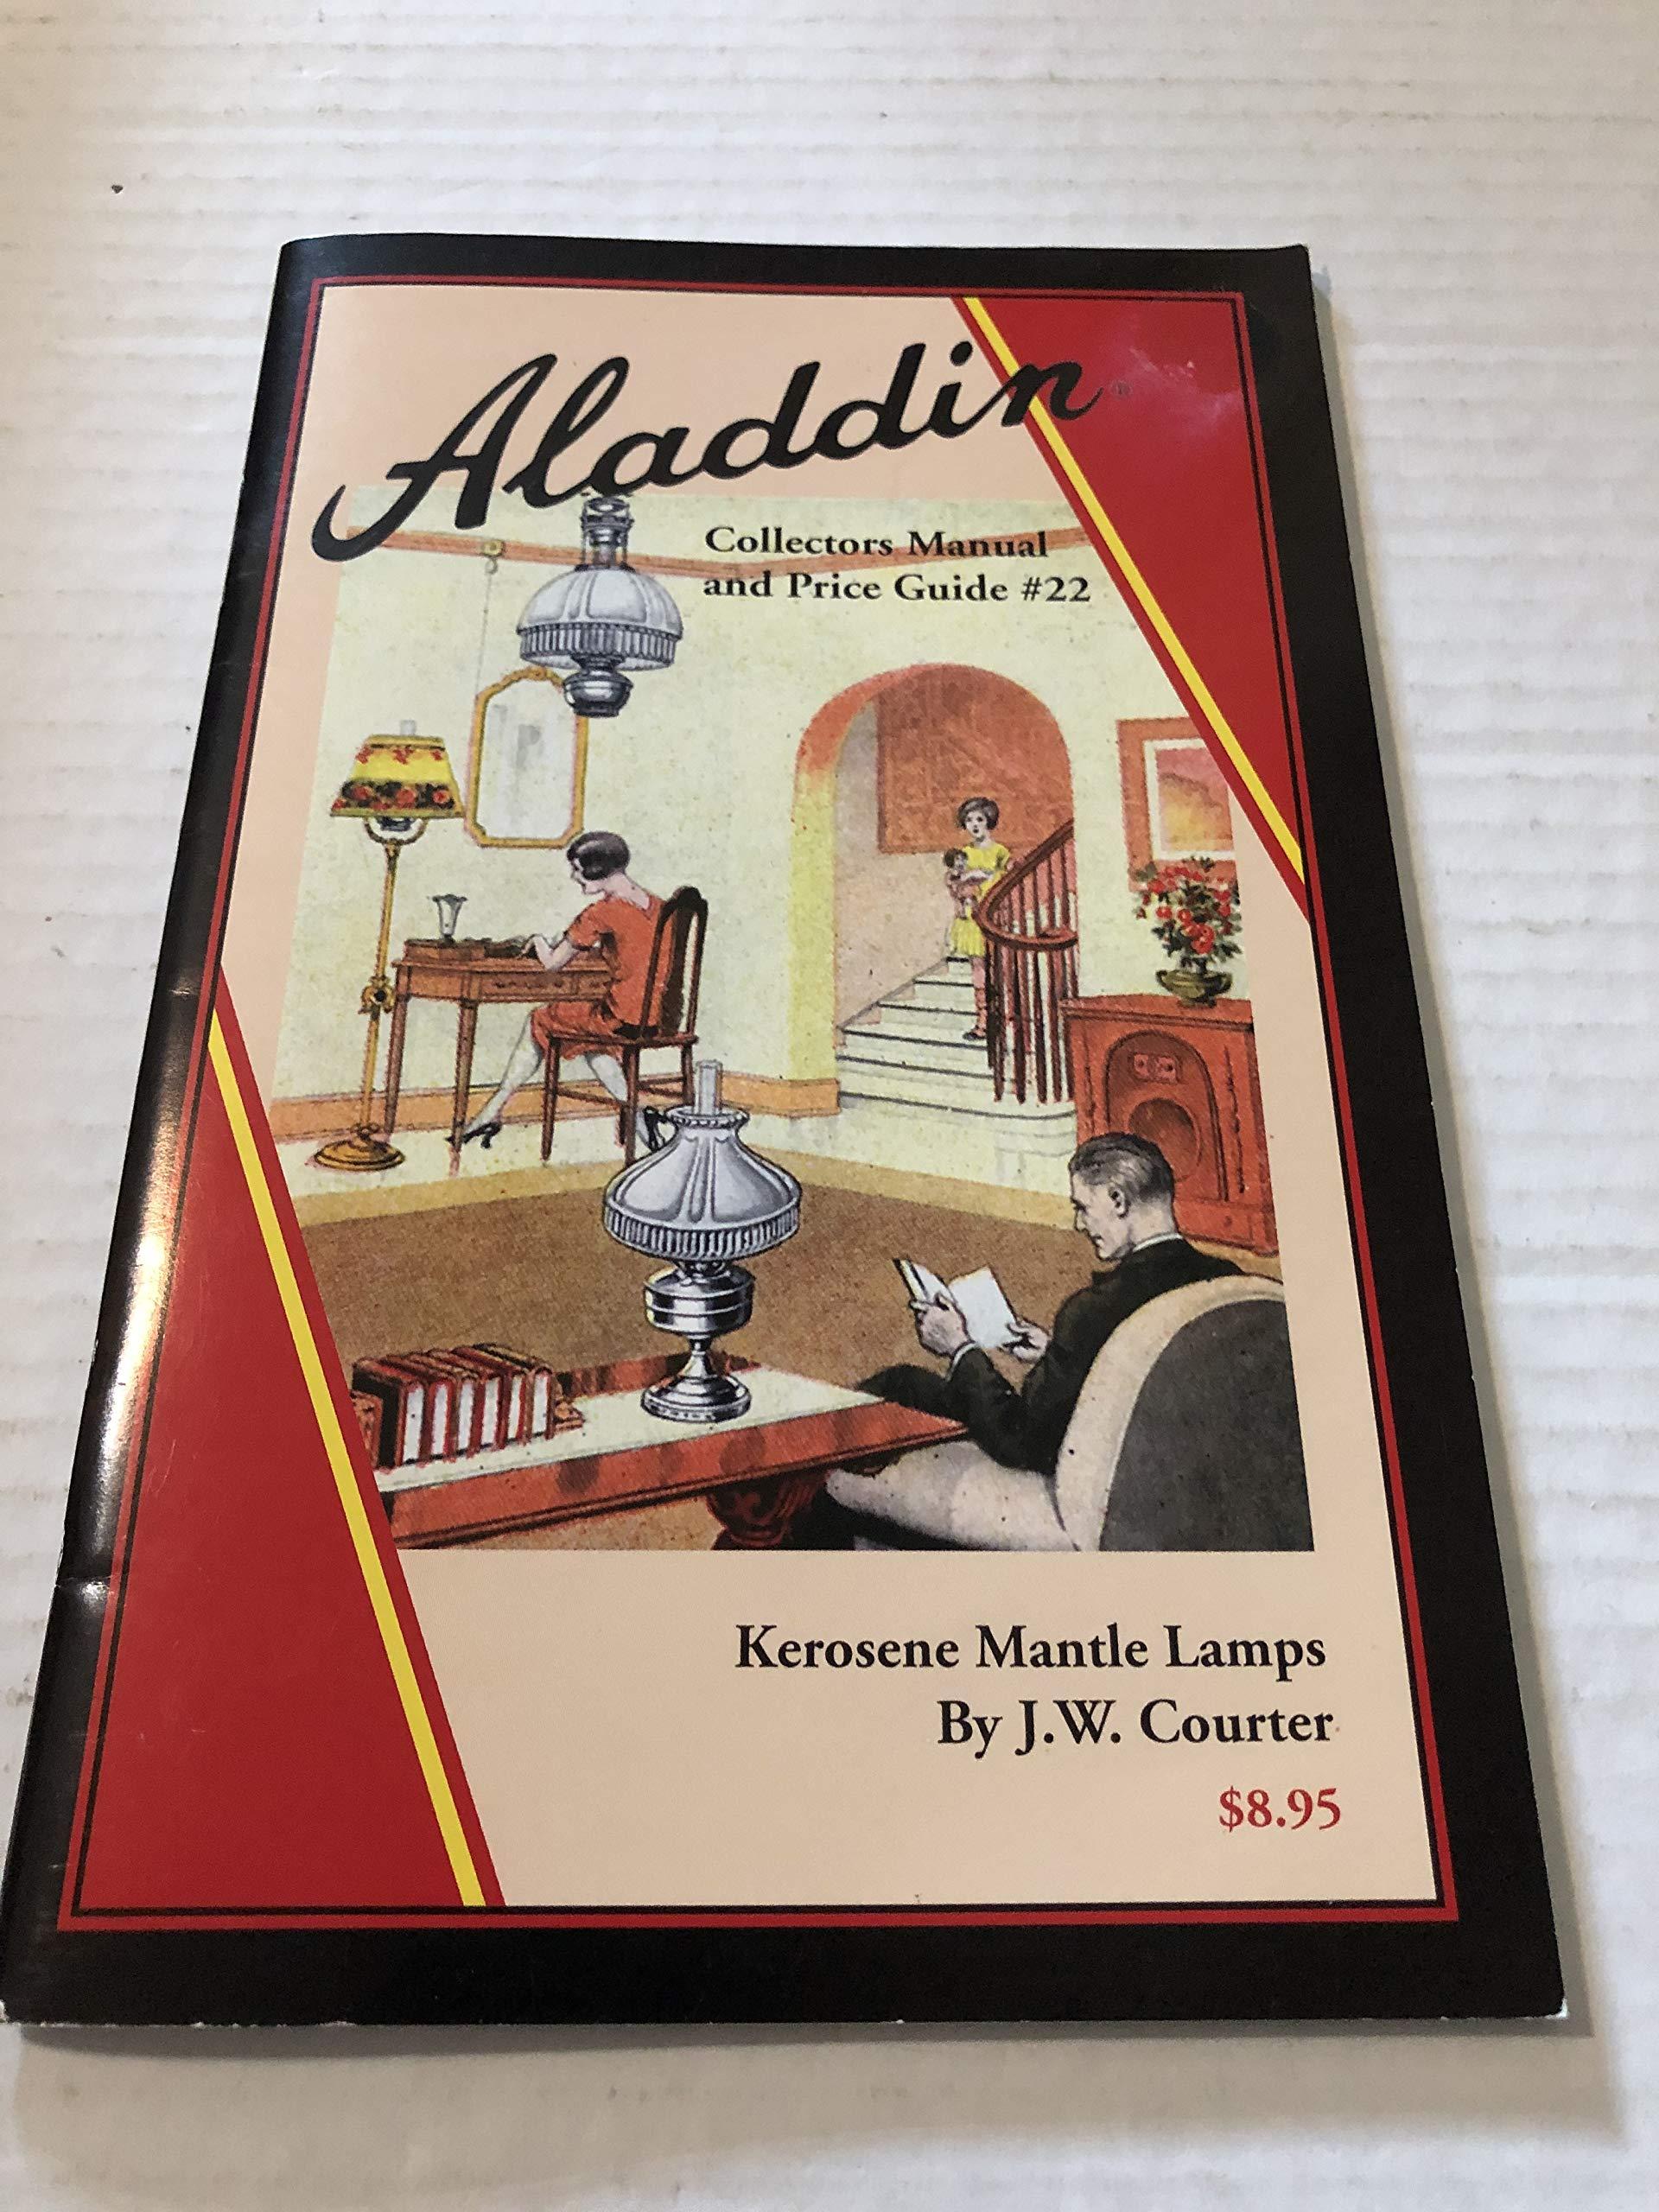 Aladdin ManualPrice Guide22Kerosene Collectors ManualPrice Aladdin Collectors Mantle Guide22Kerosene f7gyYb6v